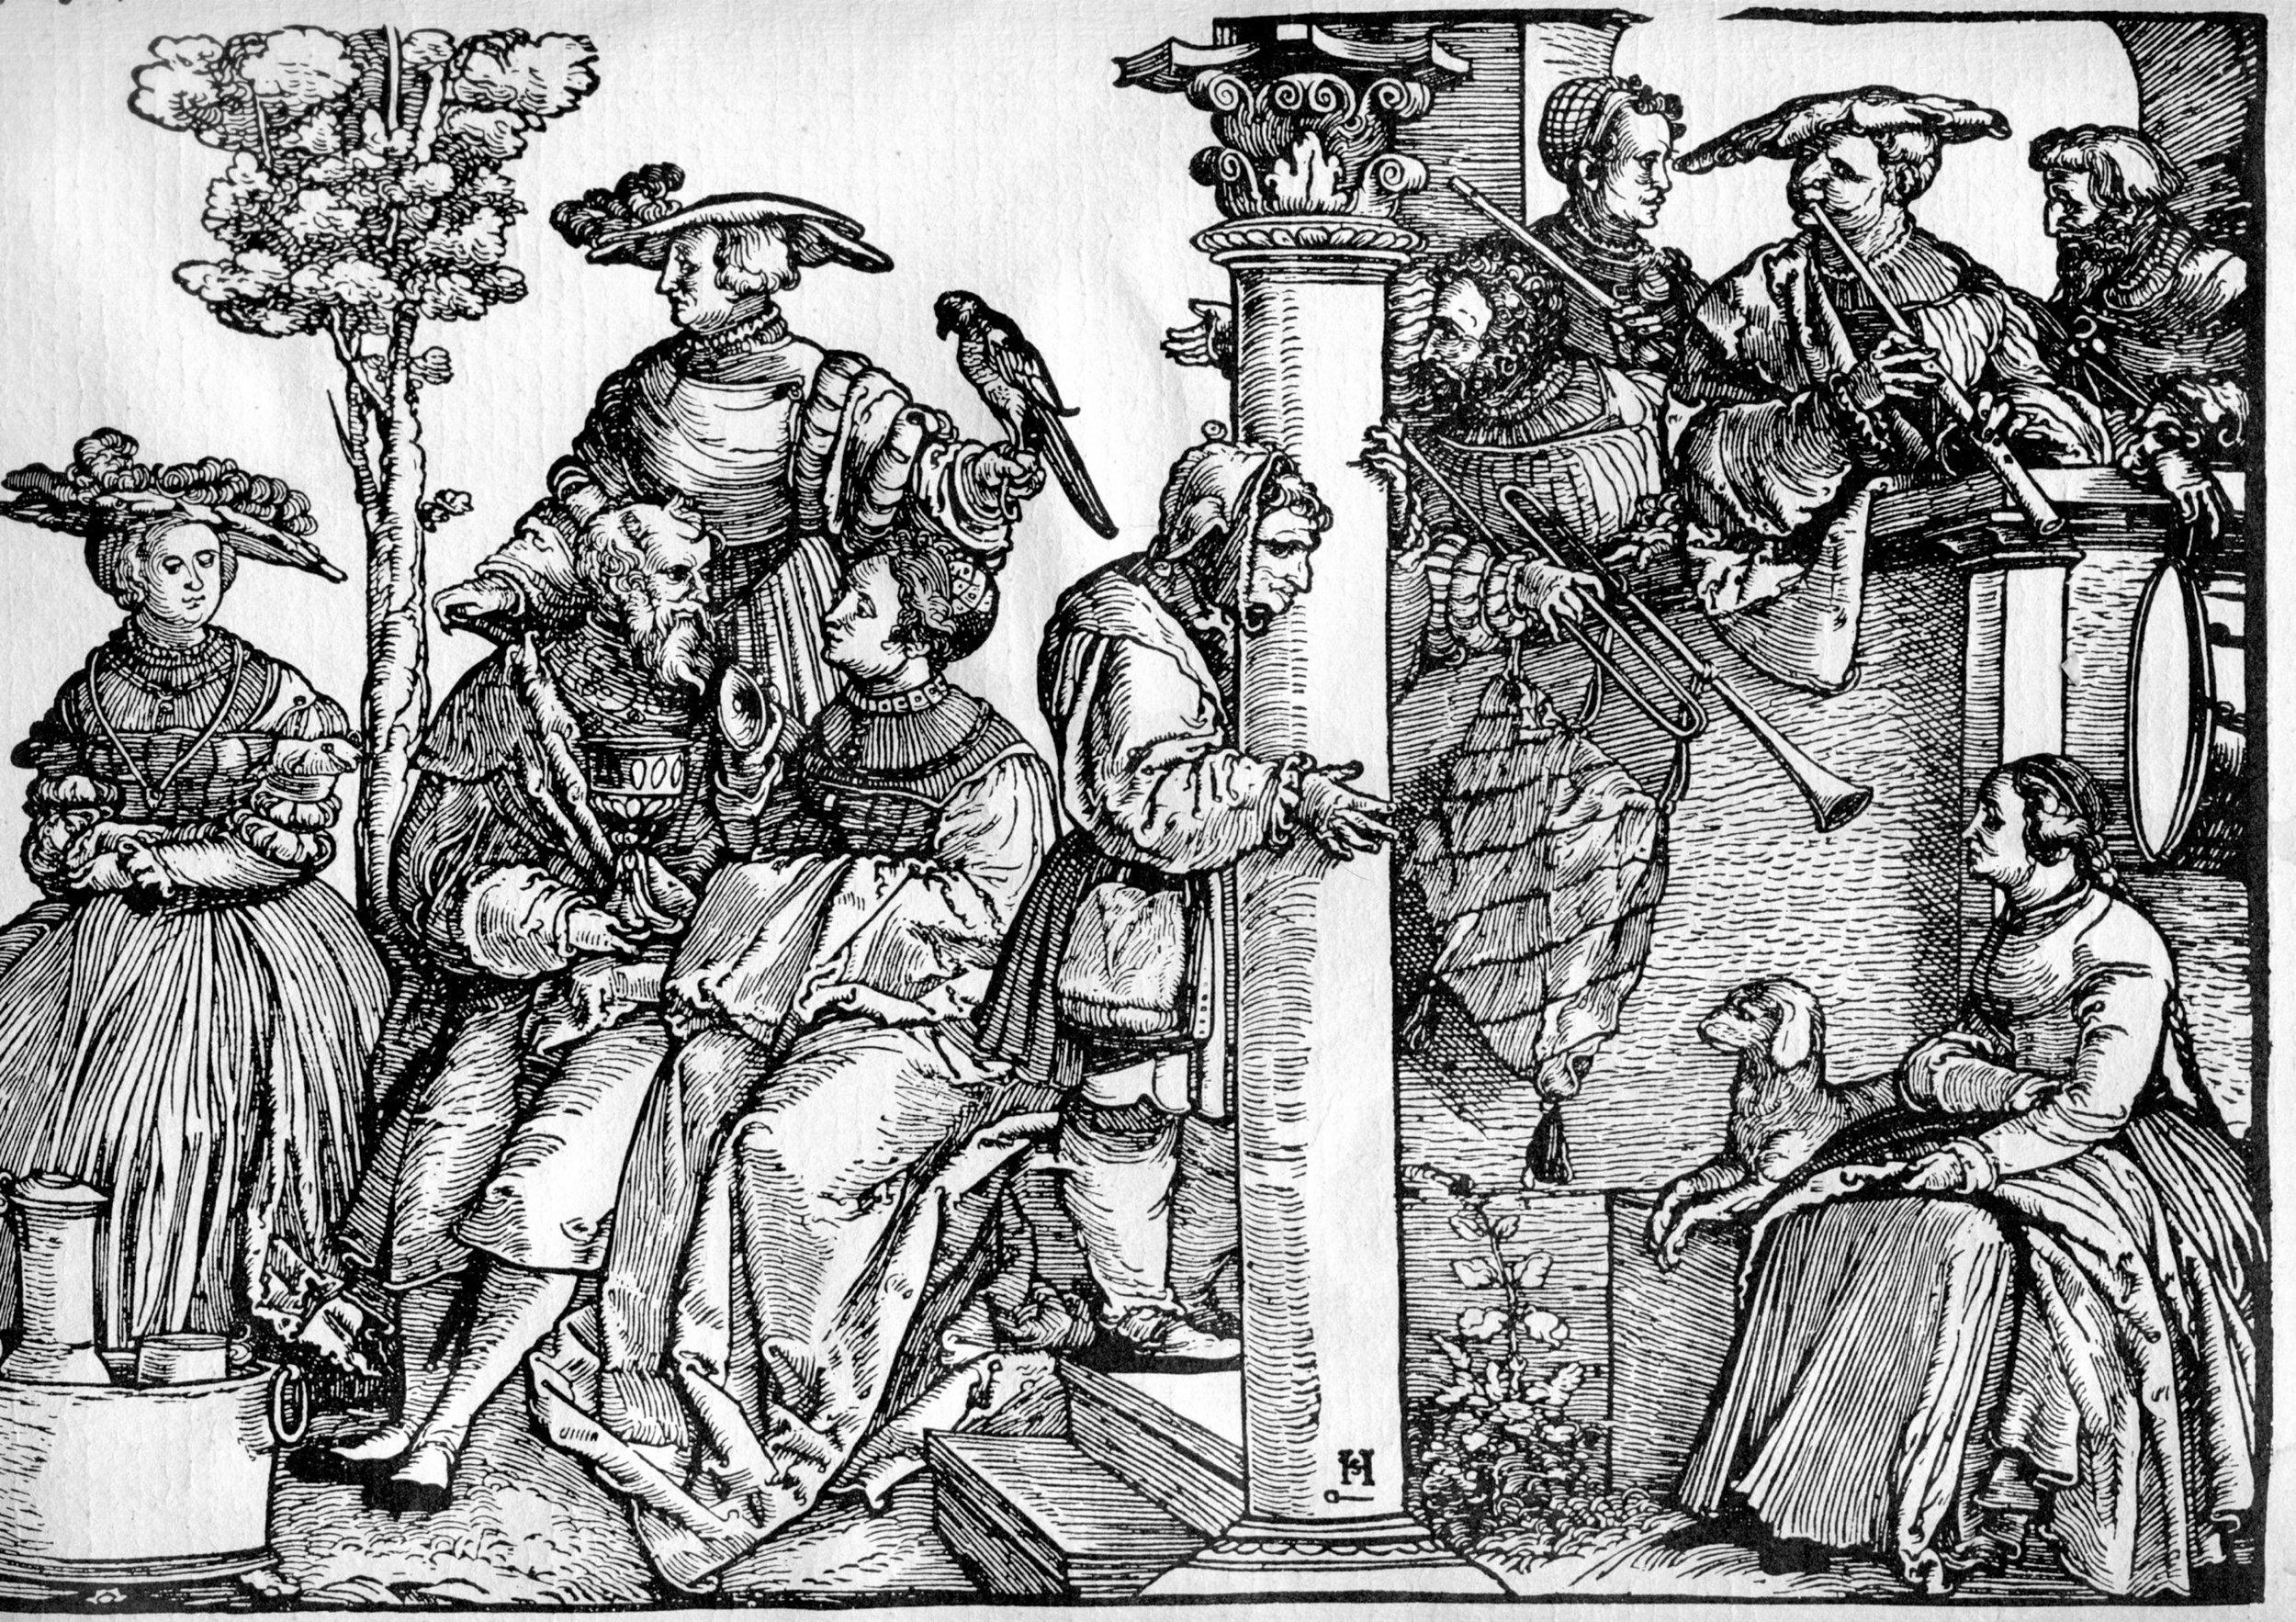 Hans Schäufelein (1480-1540), The Princess's Dance, Berlin, ca. 1535